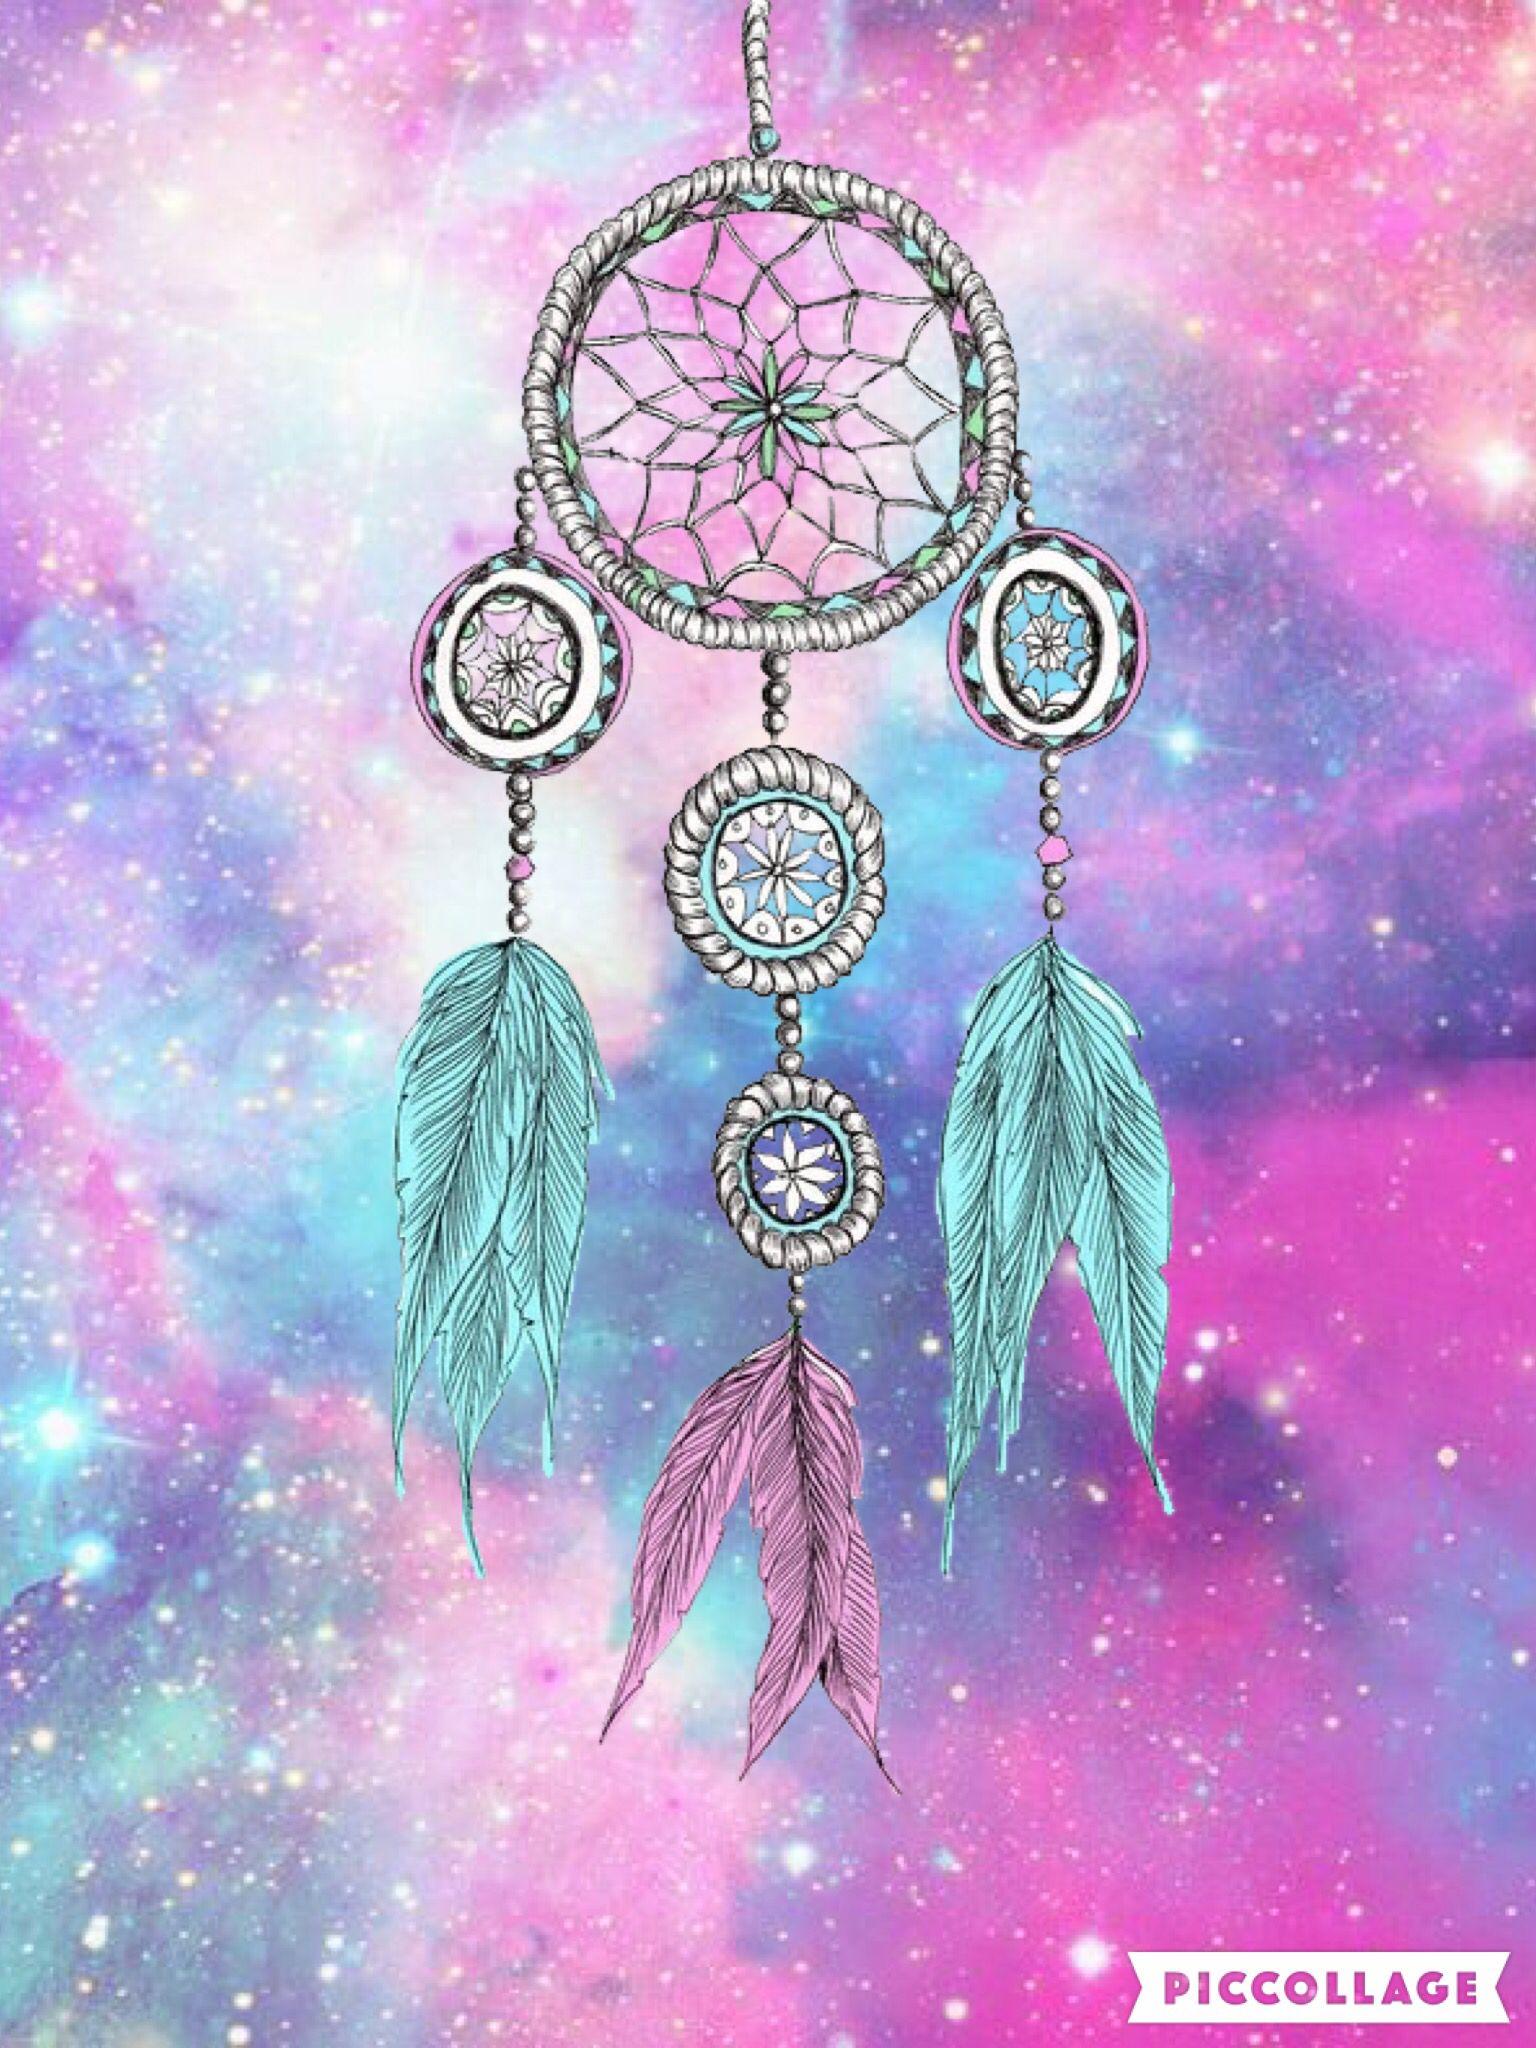 Tumblr iphone wallpaper dreamcatcher - Galaxy Dream Catcher